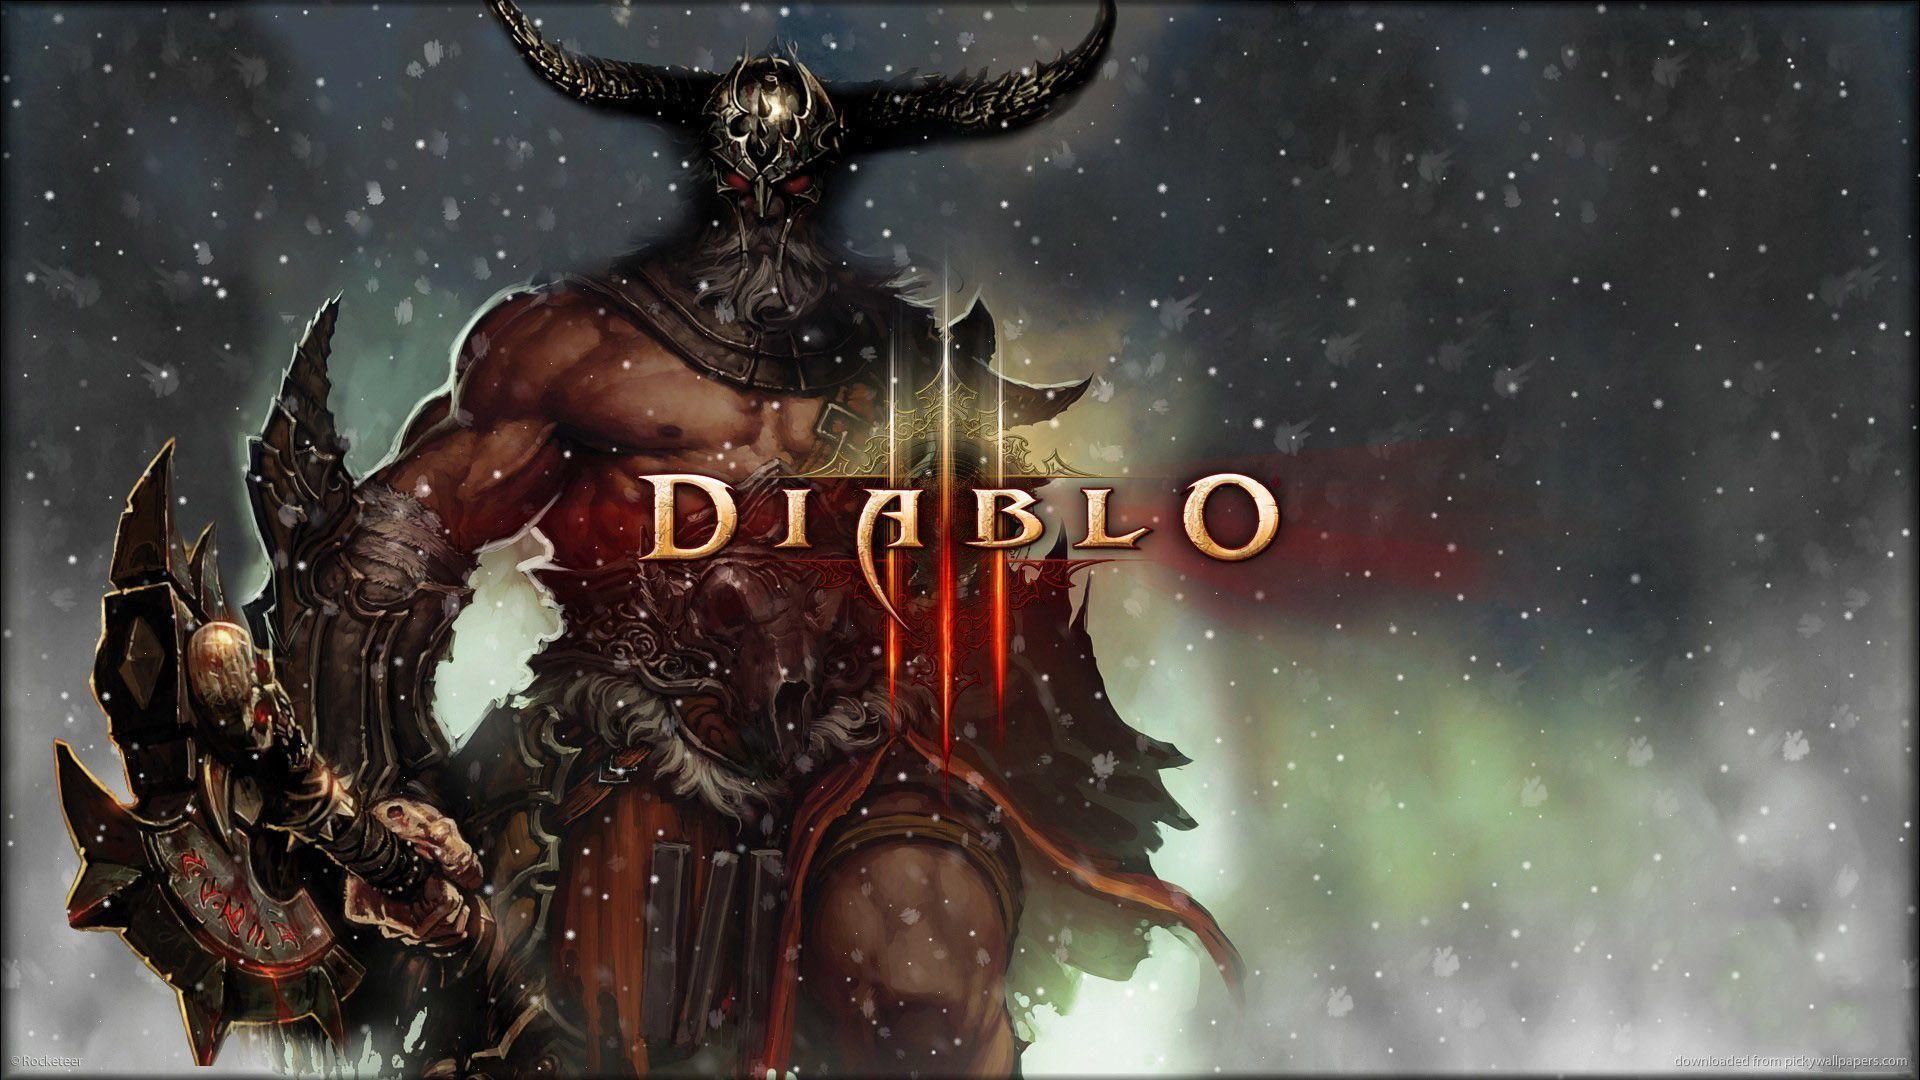 Diablo 3 Wallpapers Top Free Diablo 3 Backgrounds